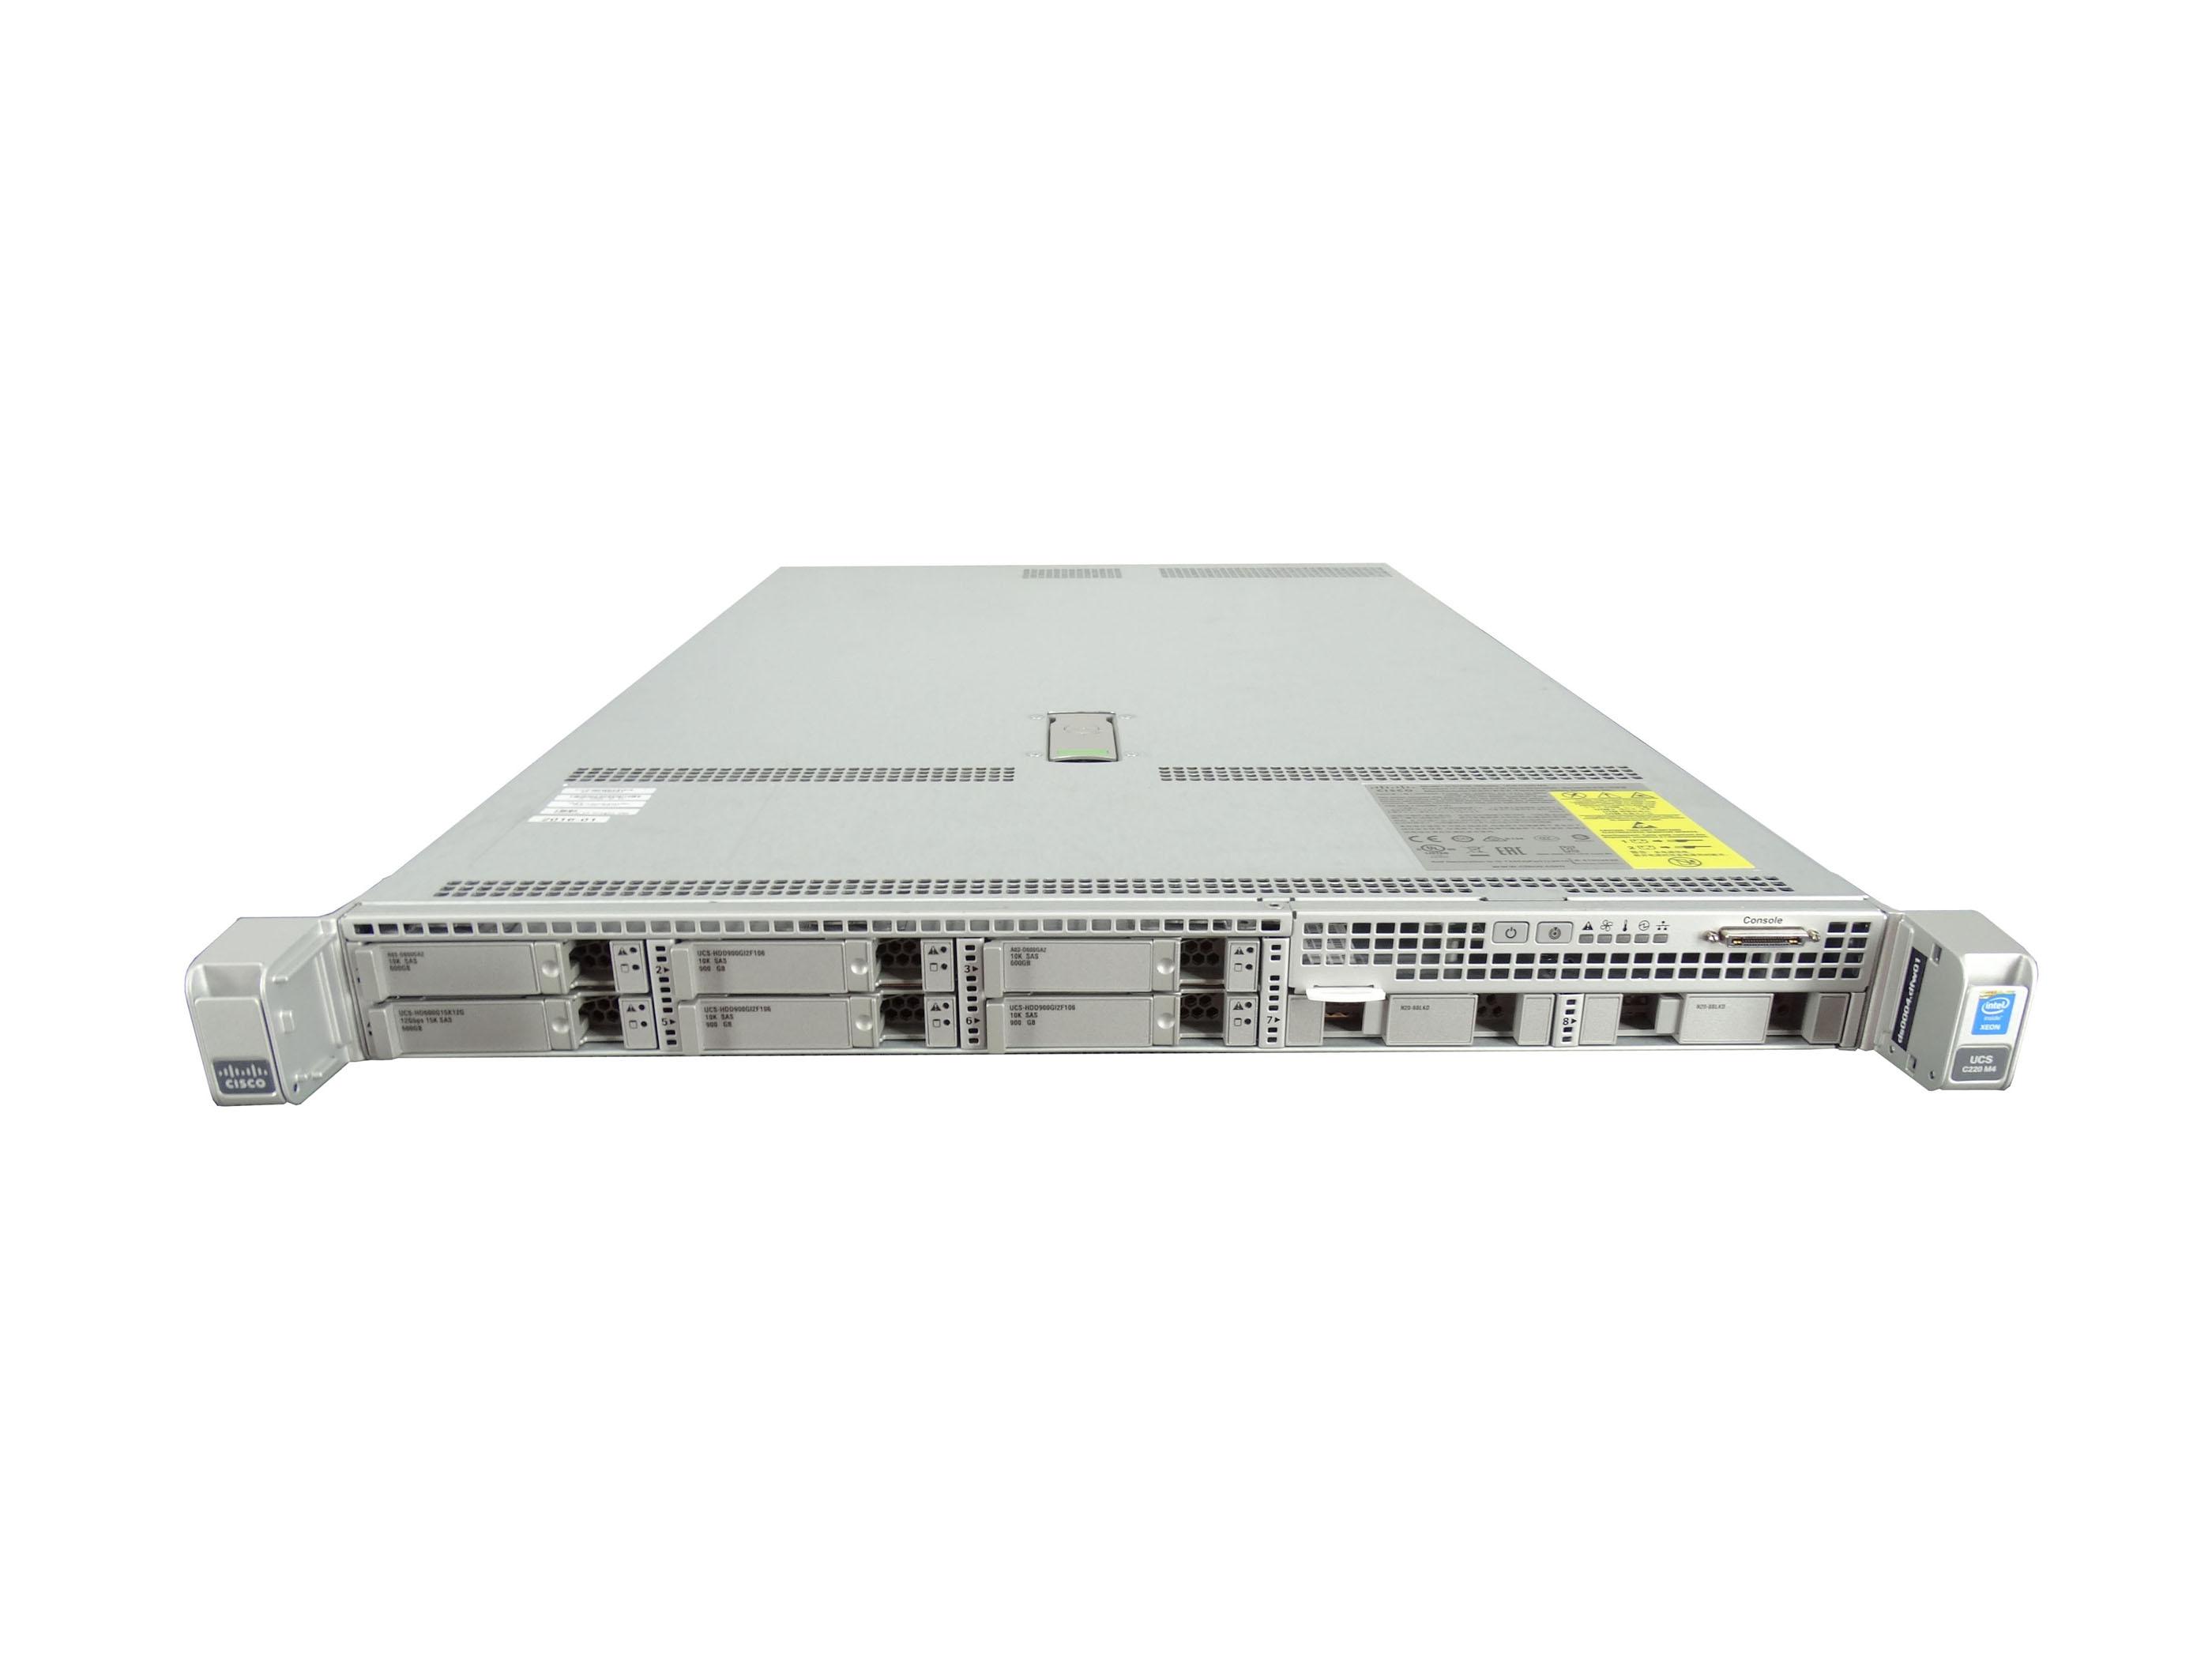 Cisco UCS C220 M4 8-Bay SFF 2x E5-2678 V3 2 5GHz 12C 64GB 4x